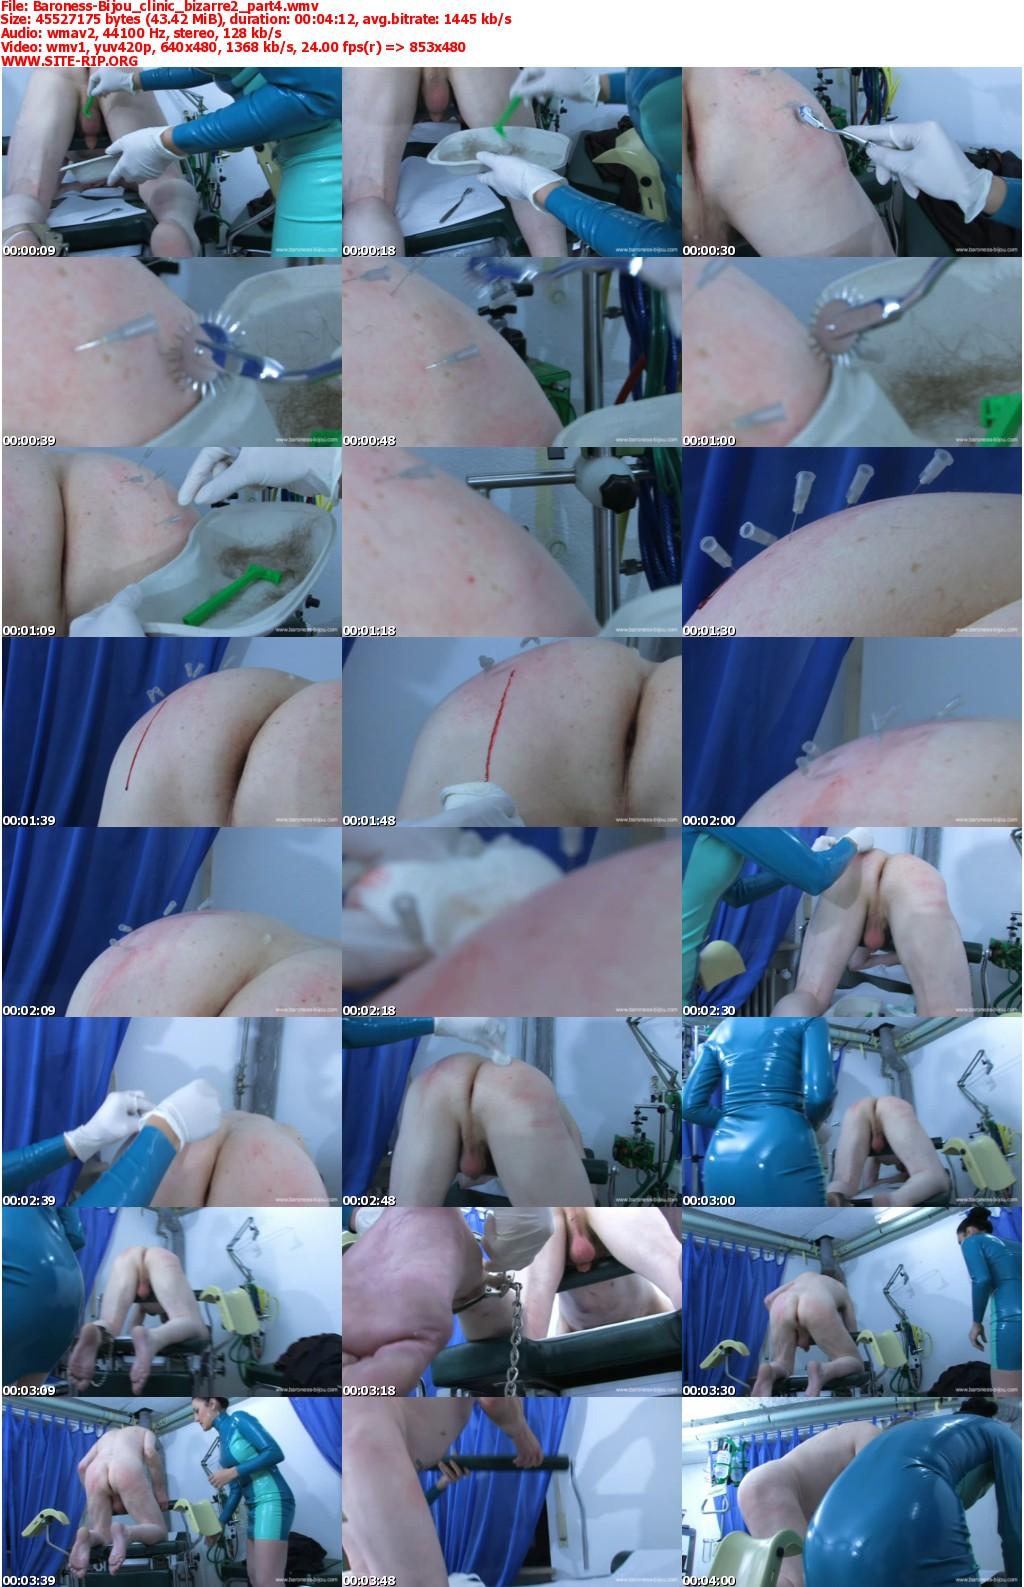 Baroness-Bijou_clinic_bizarre2_part4_s.jpg